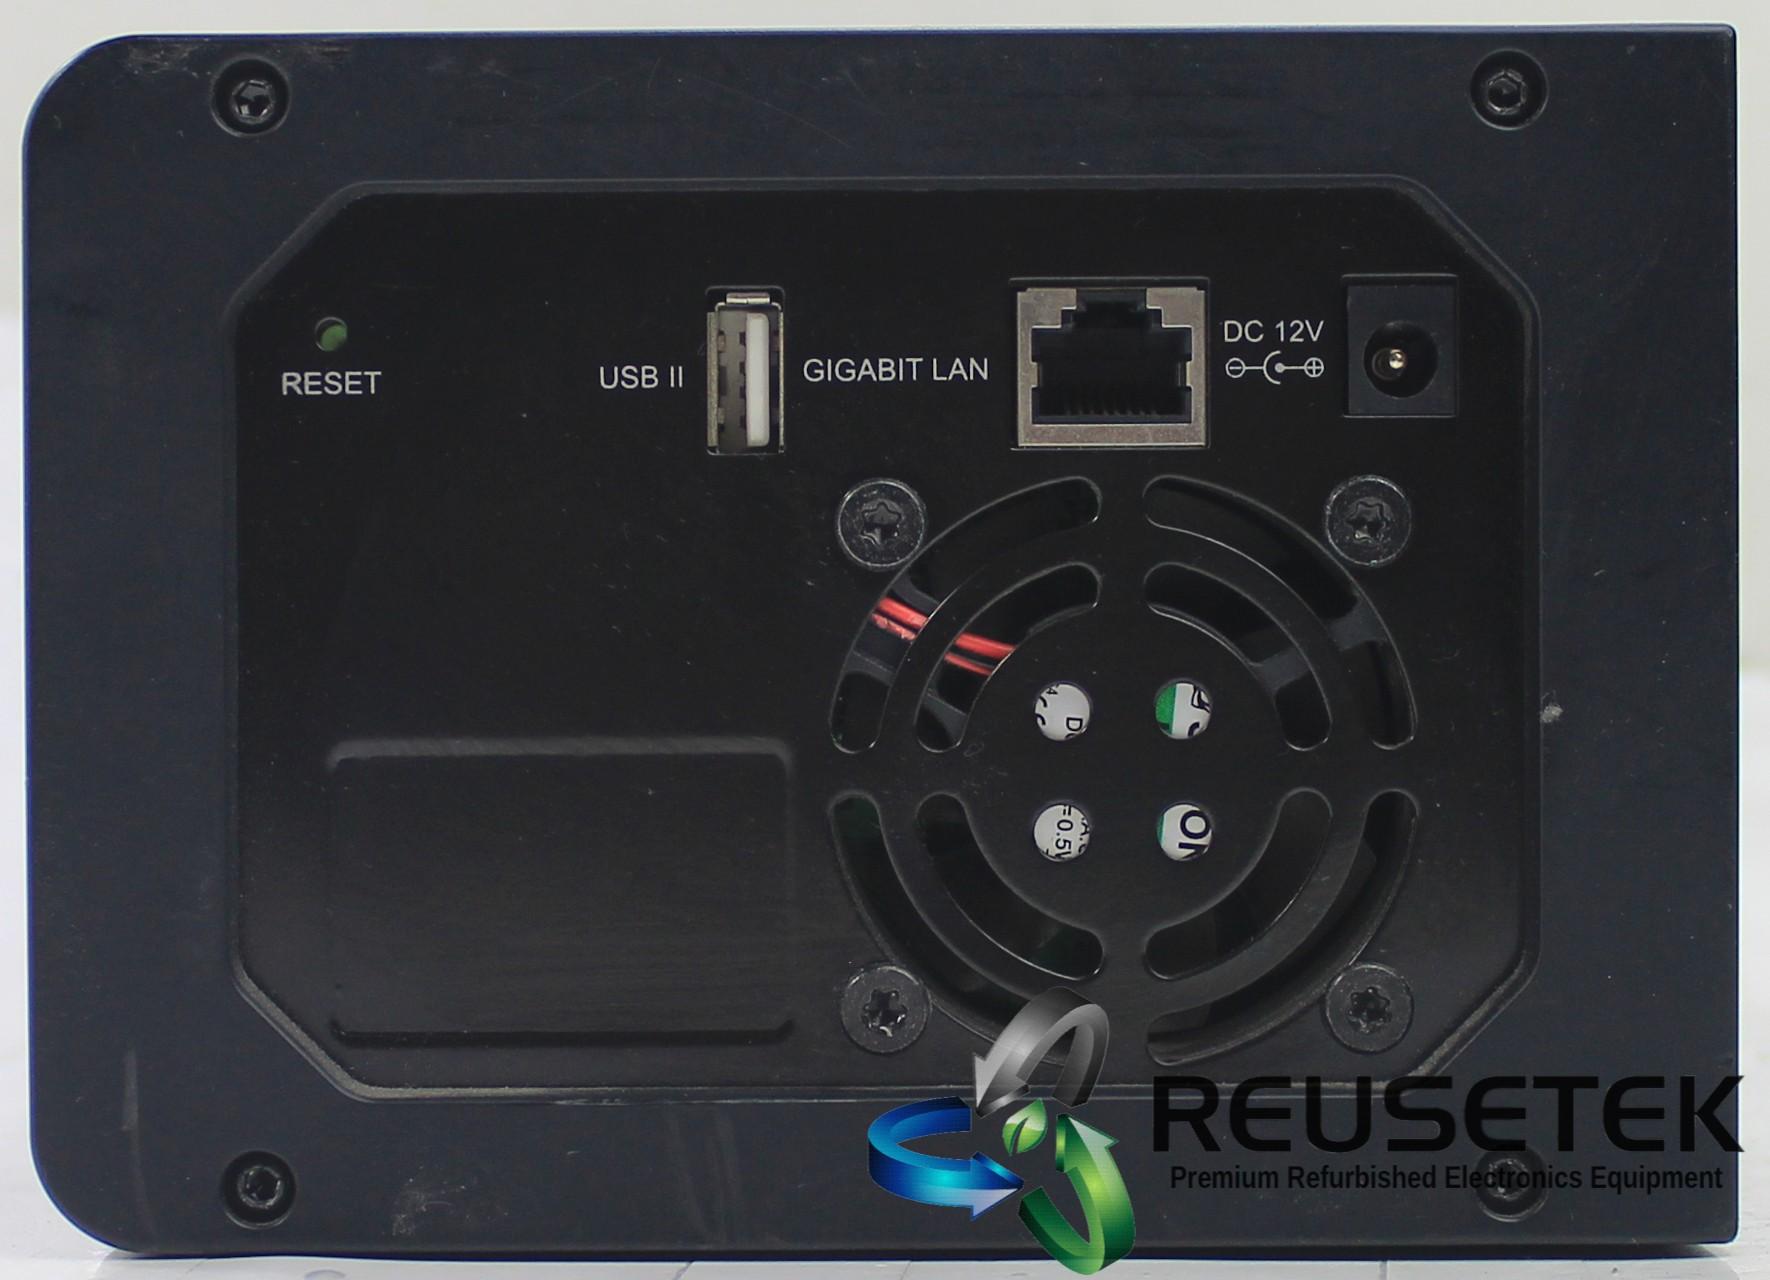 CDH5224-SN11740559,SN11740541-Patriot PCNASVK35S2 Valkryrie 2 Bay Network Attached Storage (NAS) -image